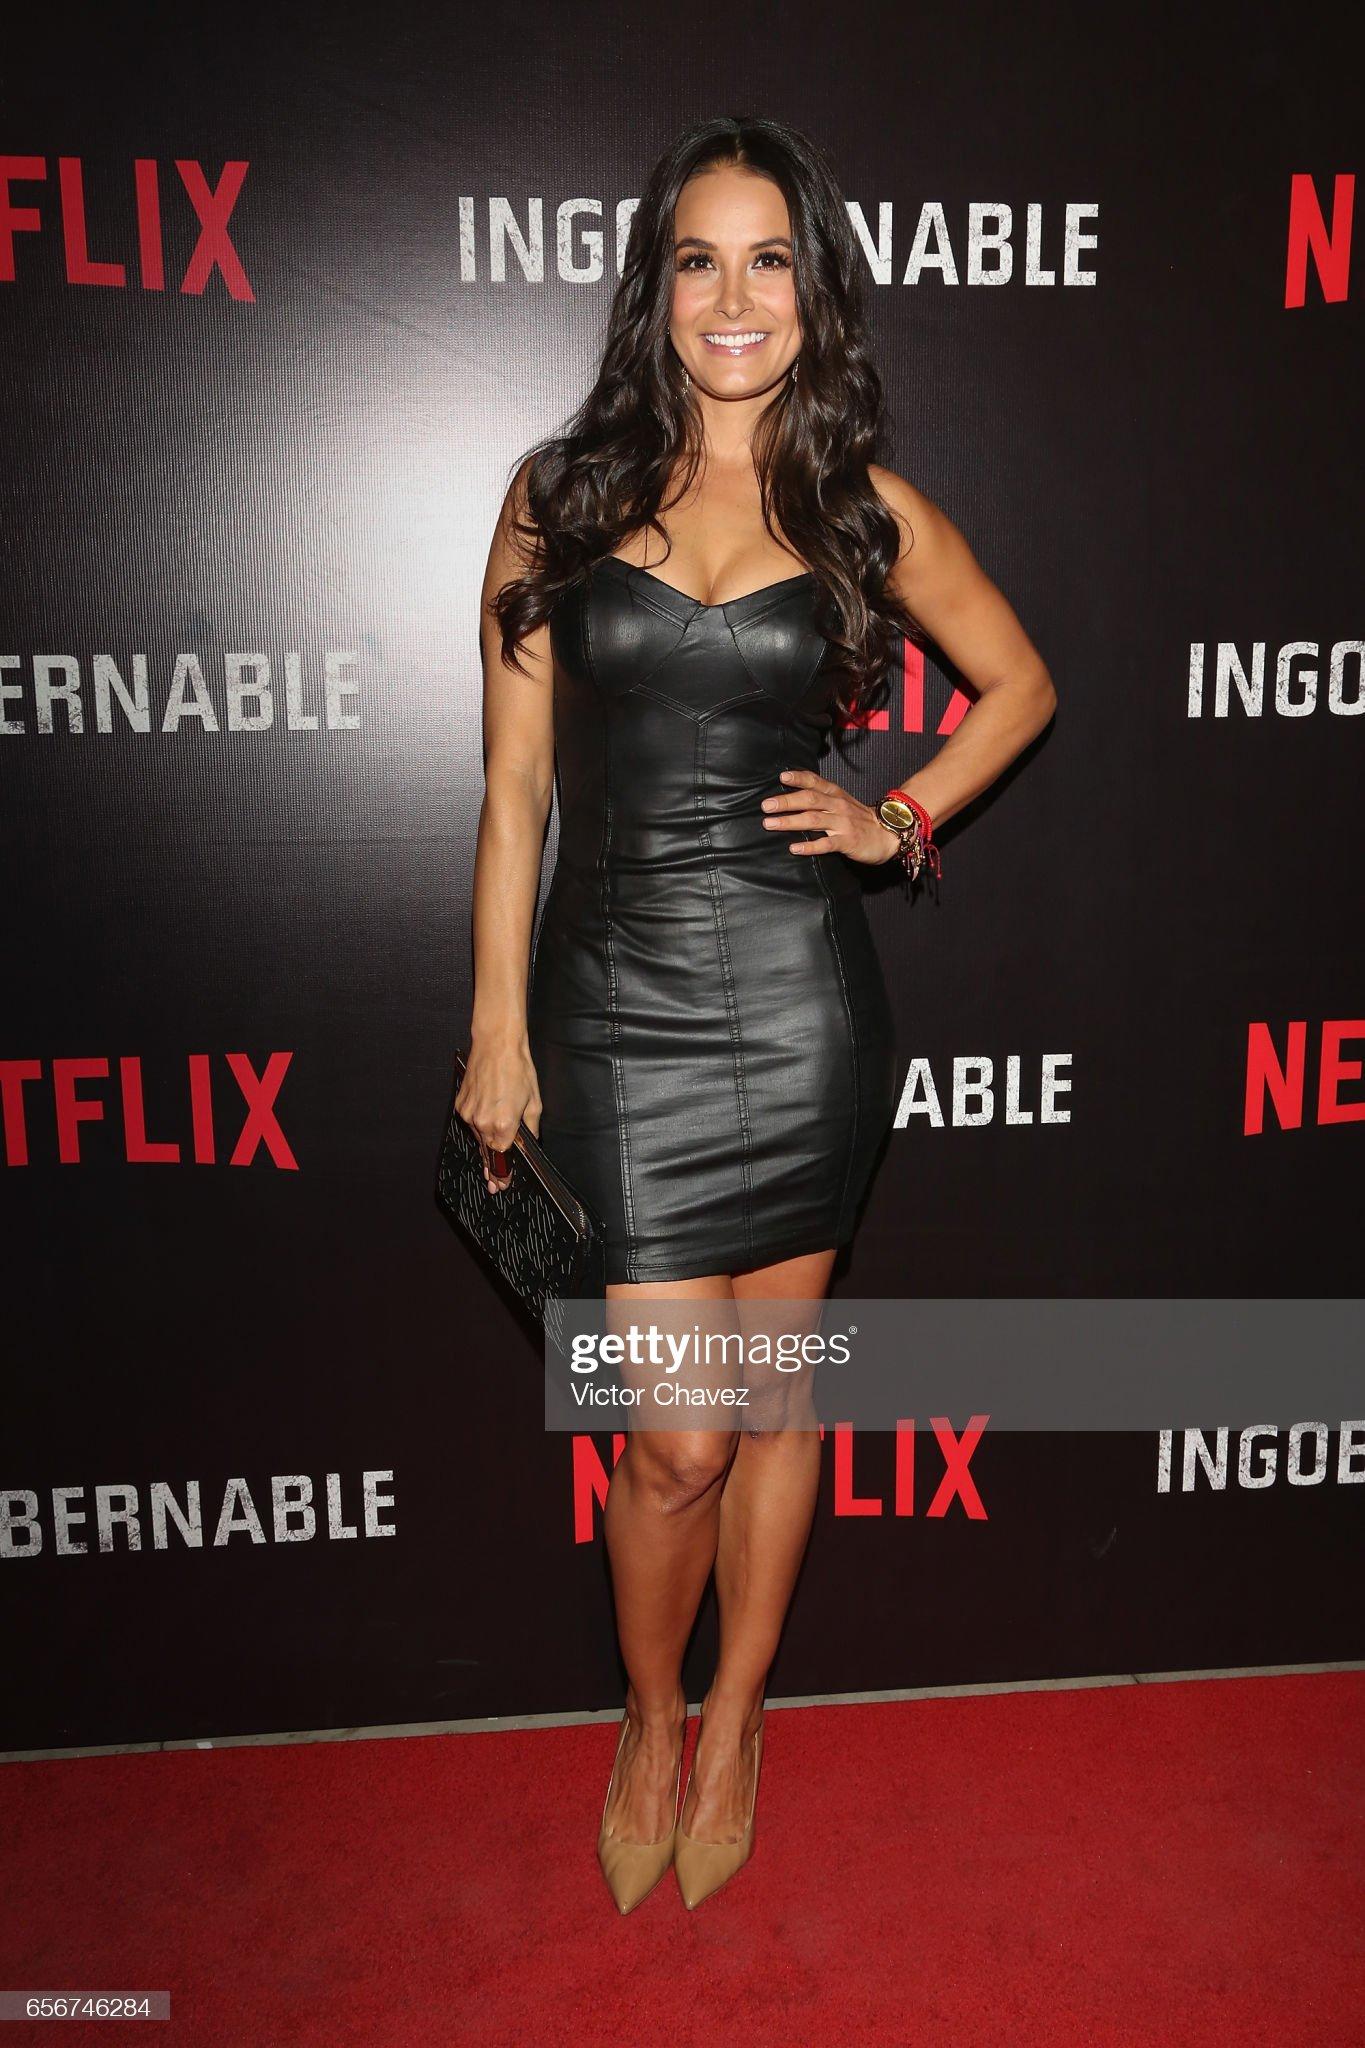 ¿Cuánto mide Gina Holguín? - Altura - Real height Georgina-holguin-attends-the-launch-of-netflixs-series-ingobernable-picture-id656746284?s=2048x2048